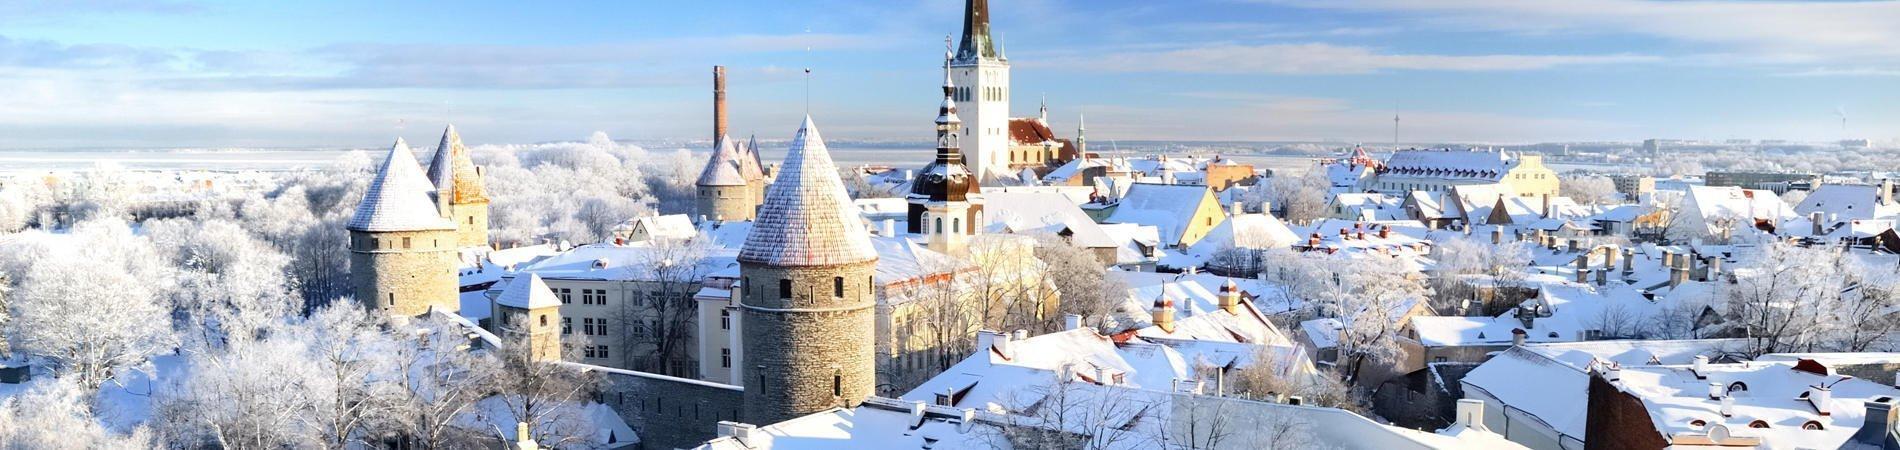 Estonya Üniversiteleri